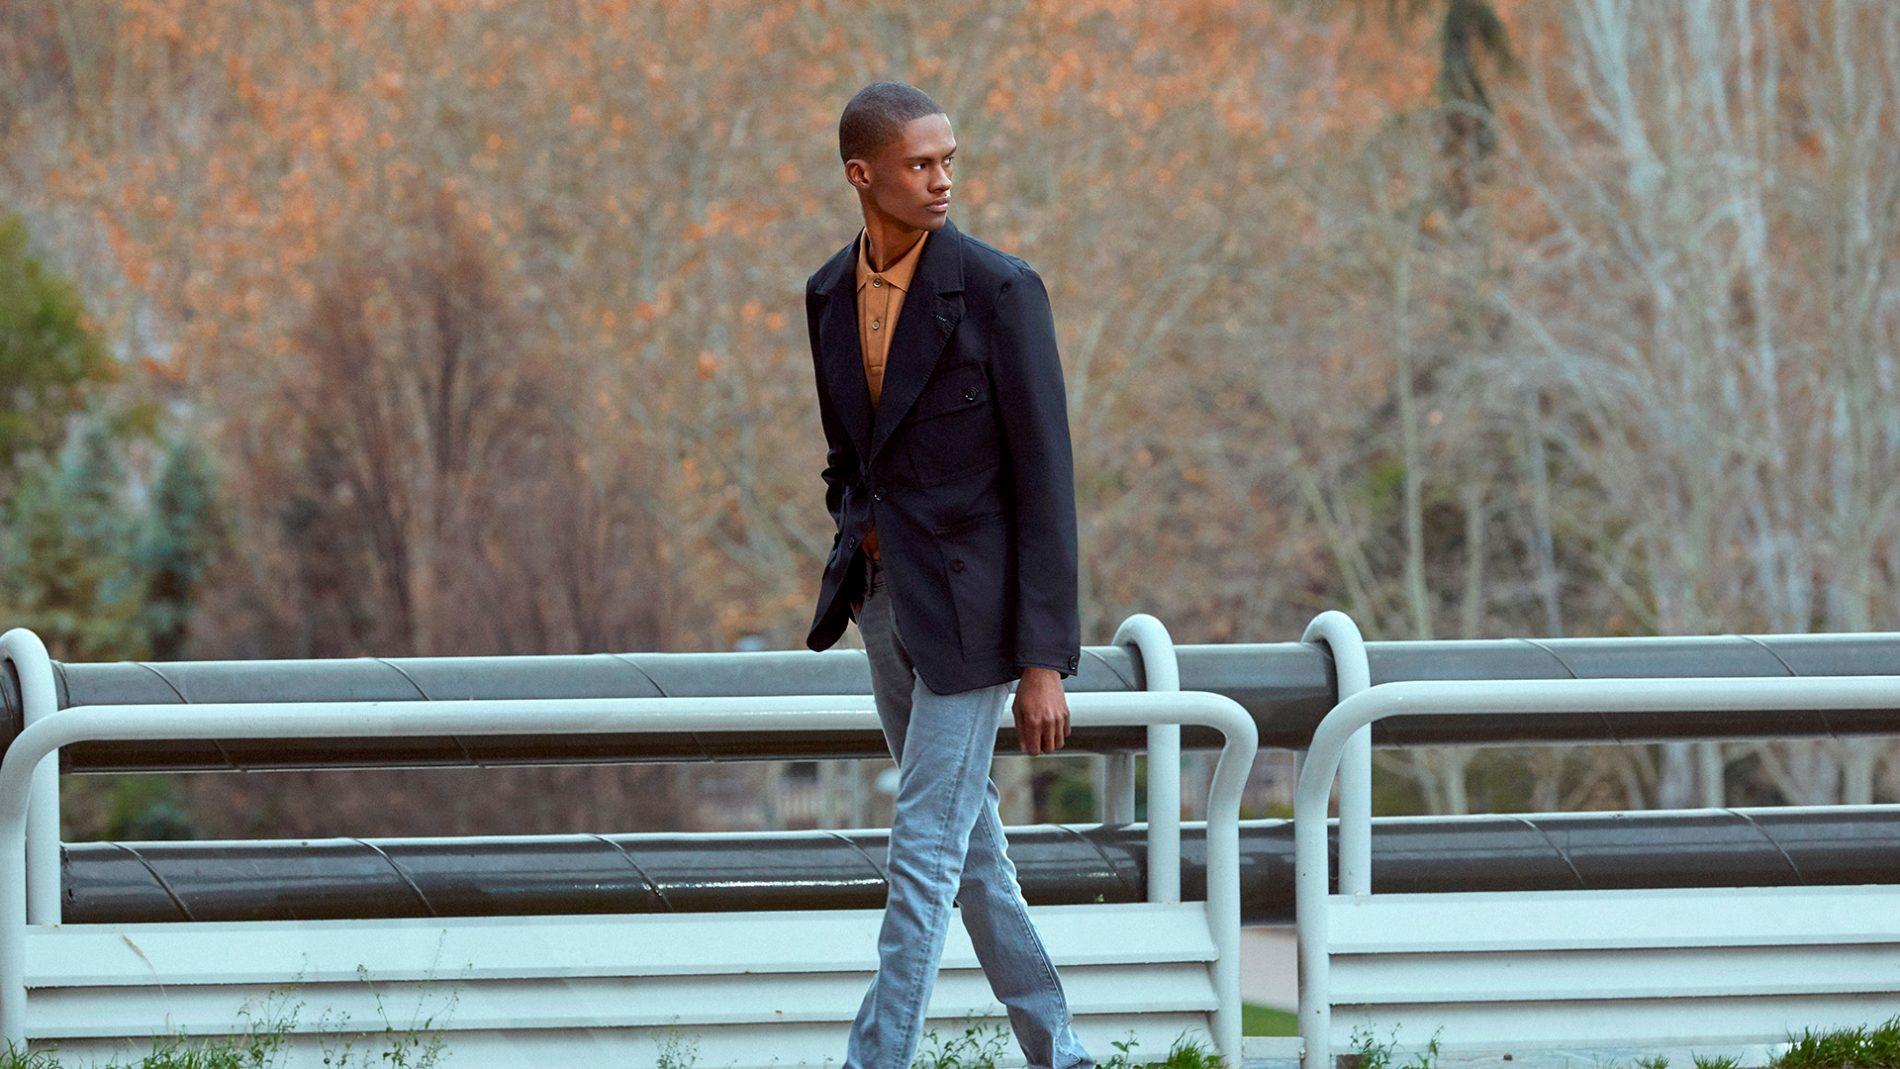 El Corte Inglés Designer Menswear Tailored Clothing Tom Ford